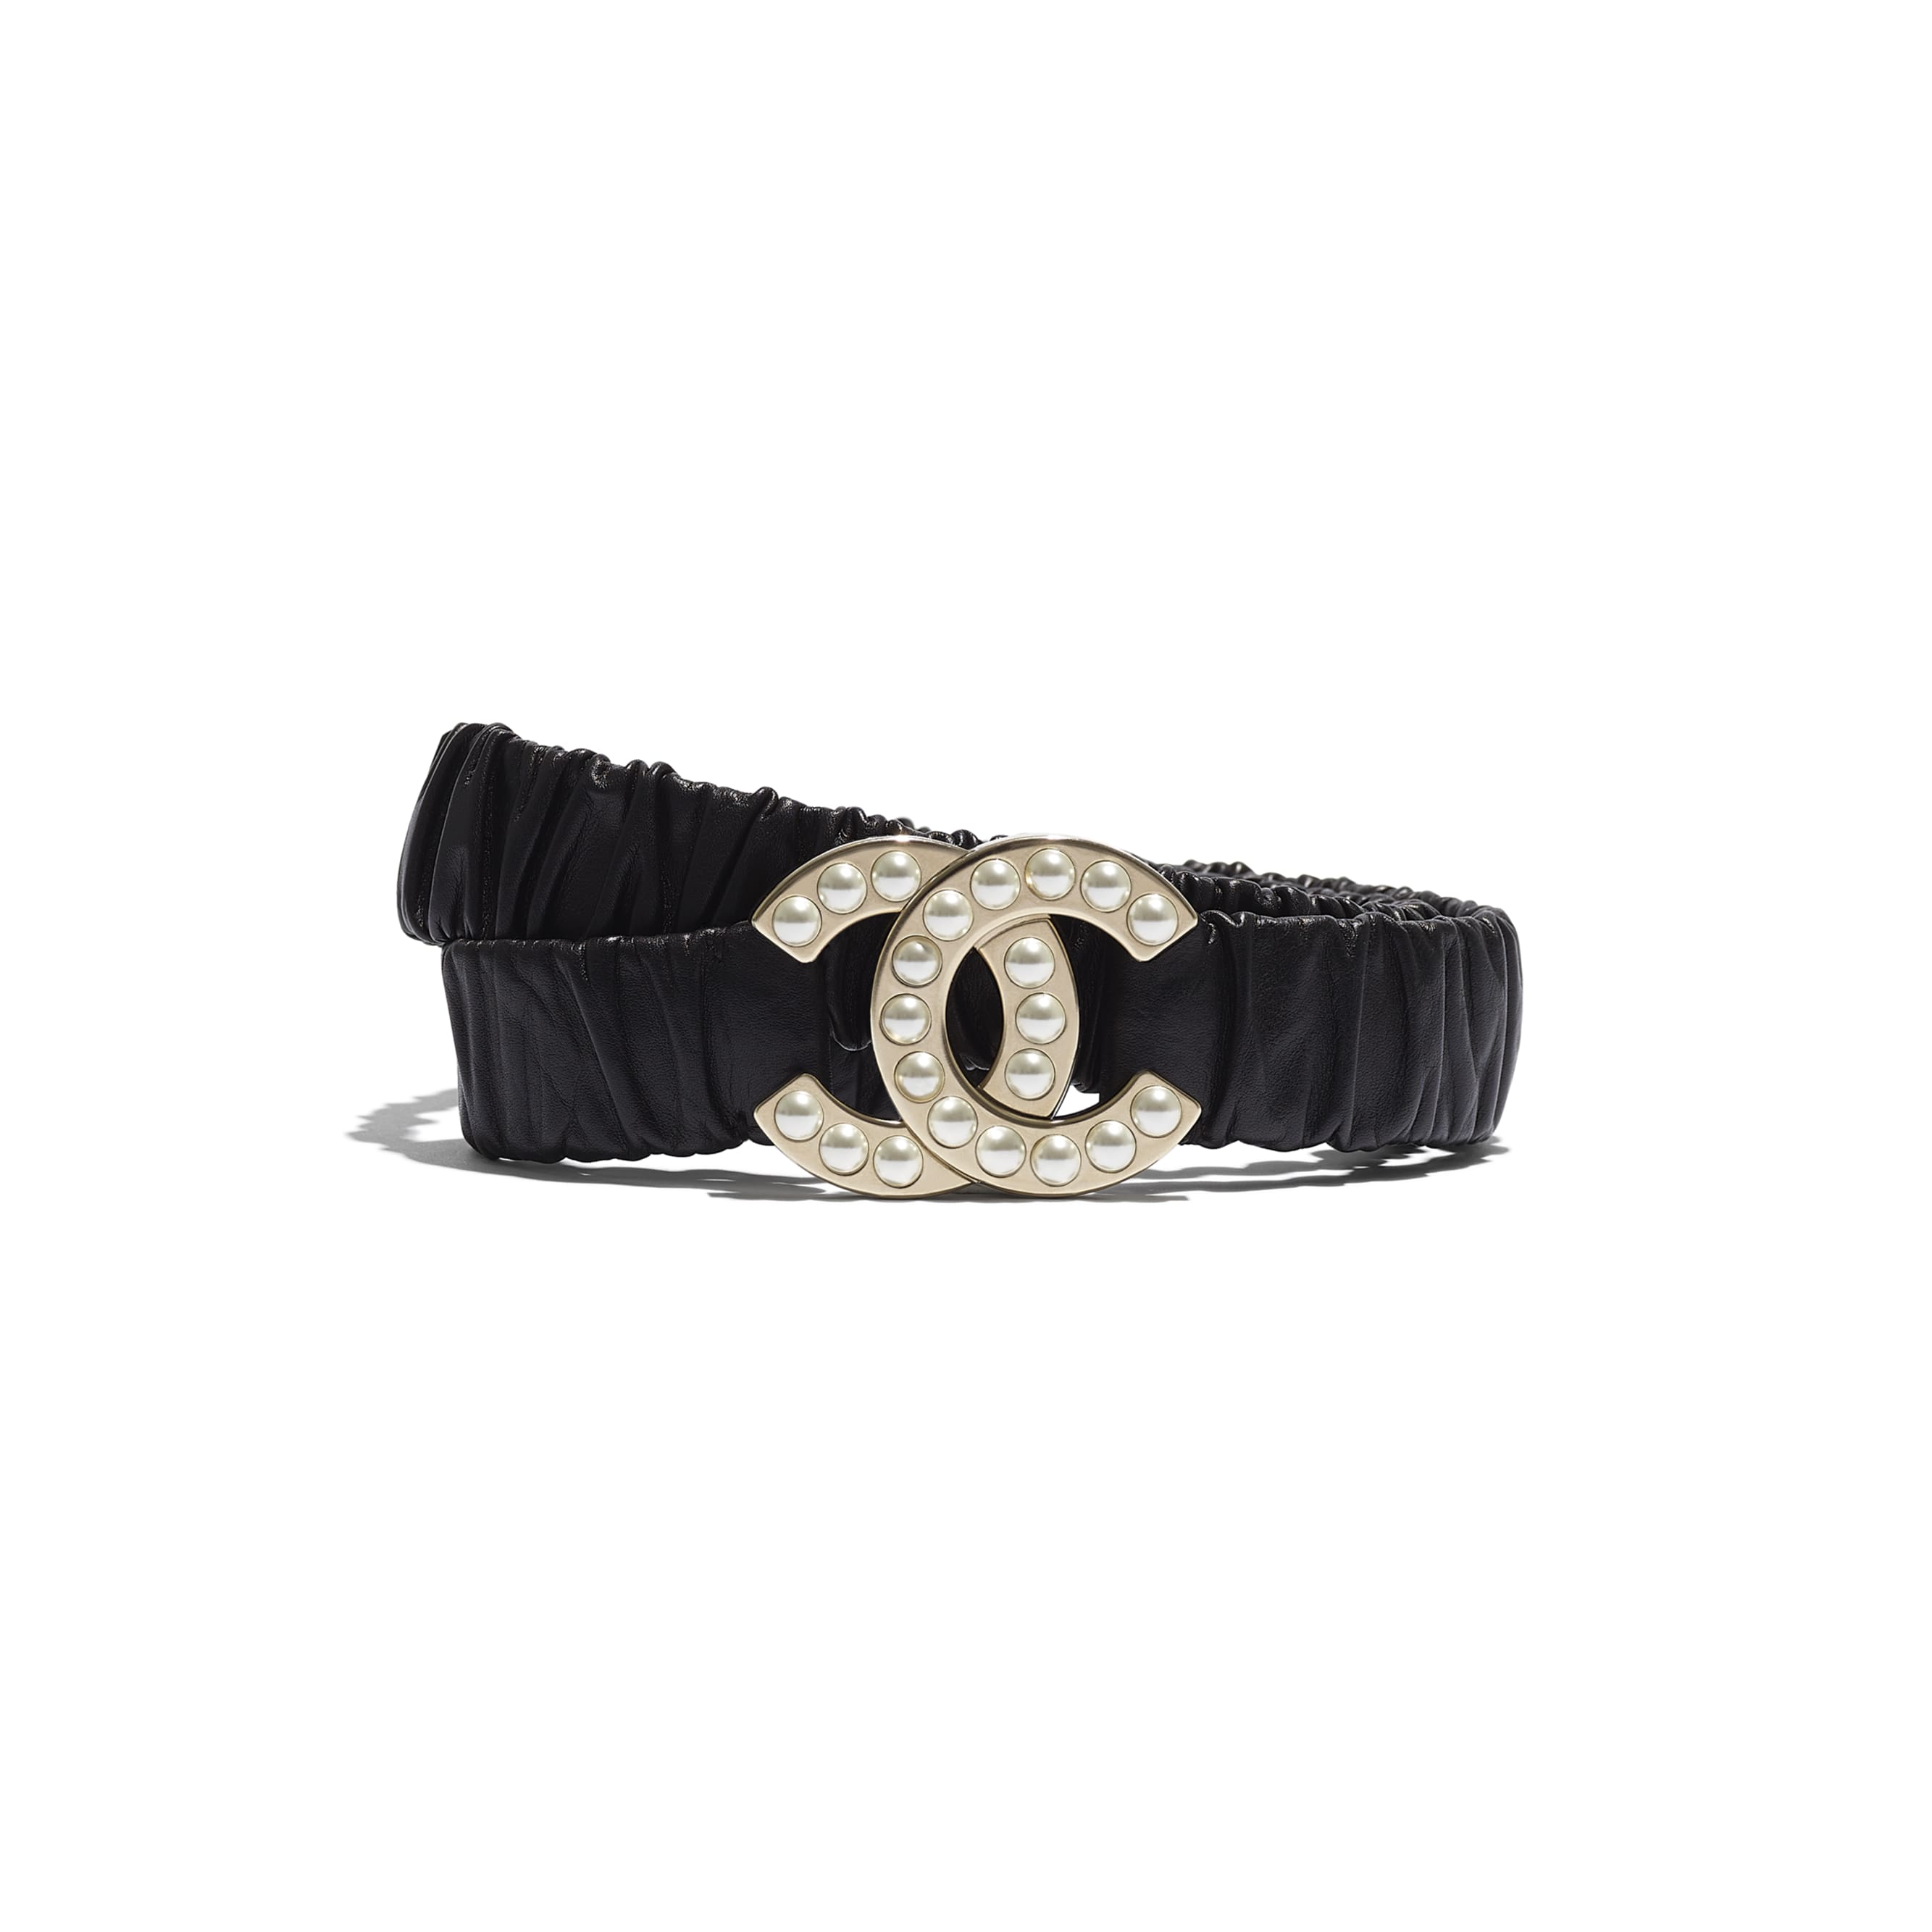 Belt - Black - Calfskin, Gold-Tone Metal & Glass Pearls - Default view - see standard sized version